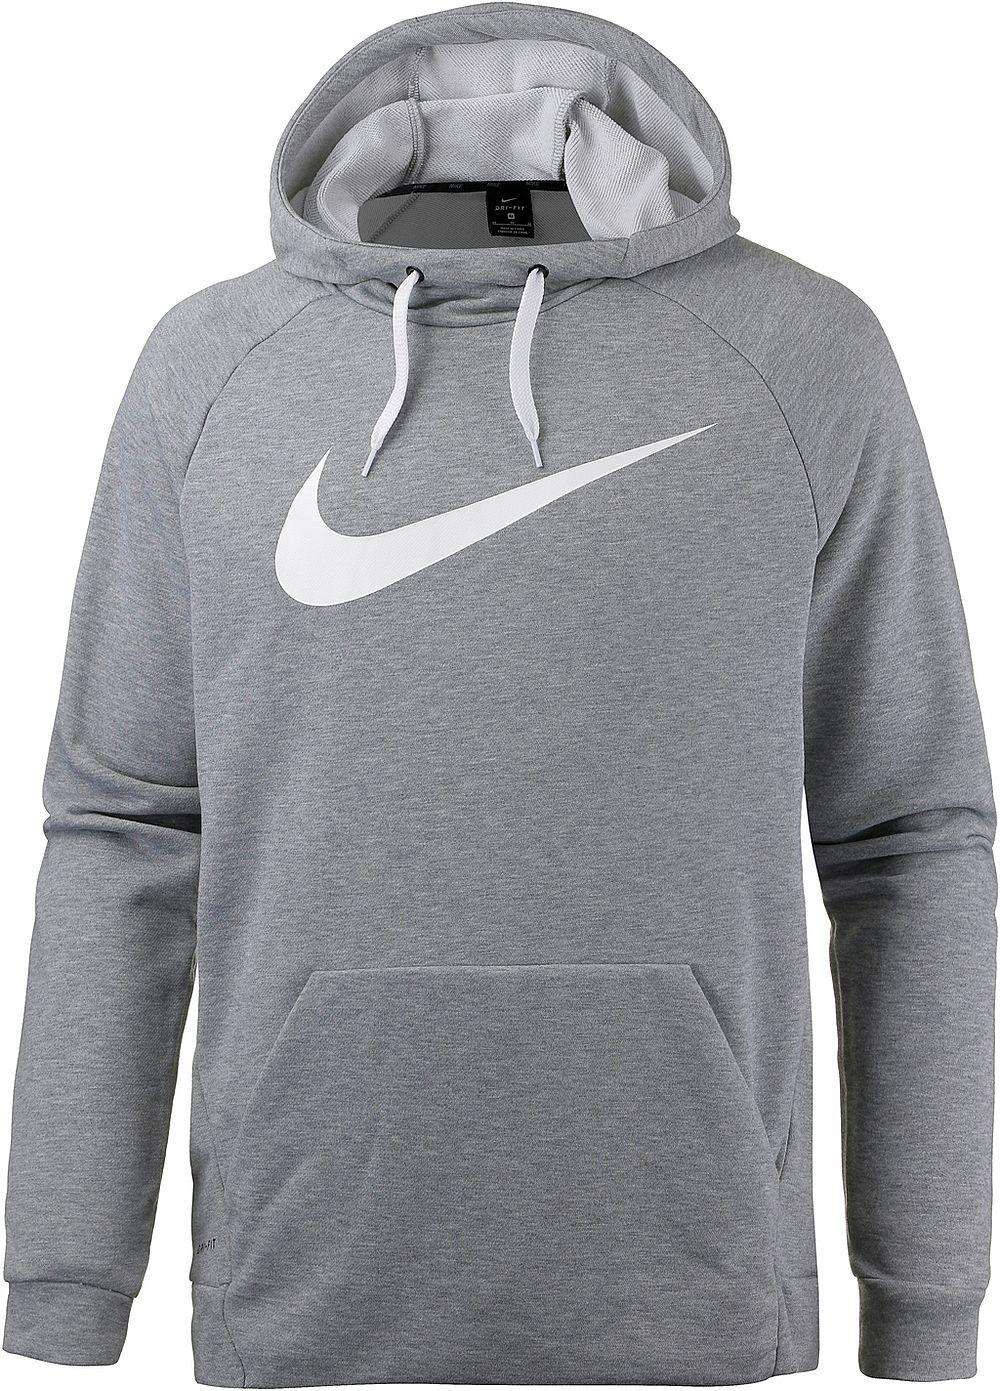 Nike Nk Dry miesten huppari Harmaa e168a54ce3